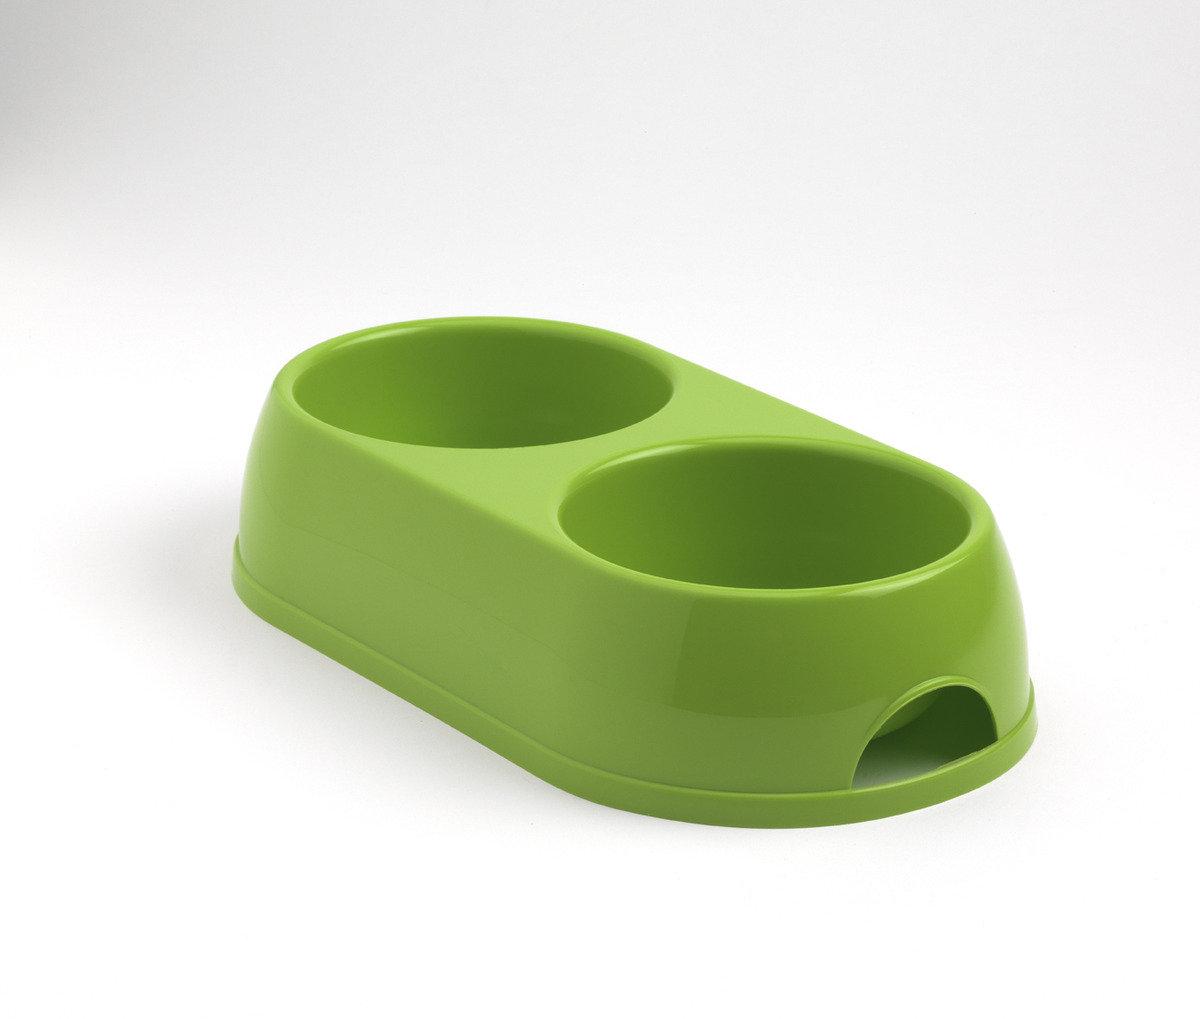 Double Bowl  寵物碗 H121 - 蘋果綠色